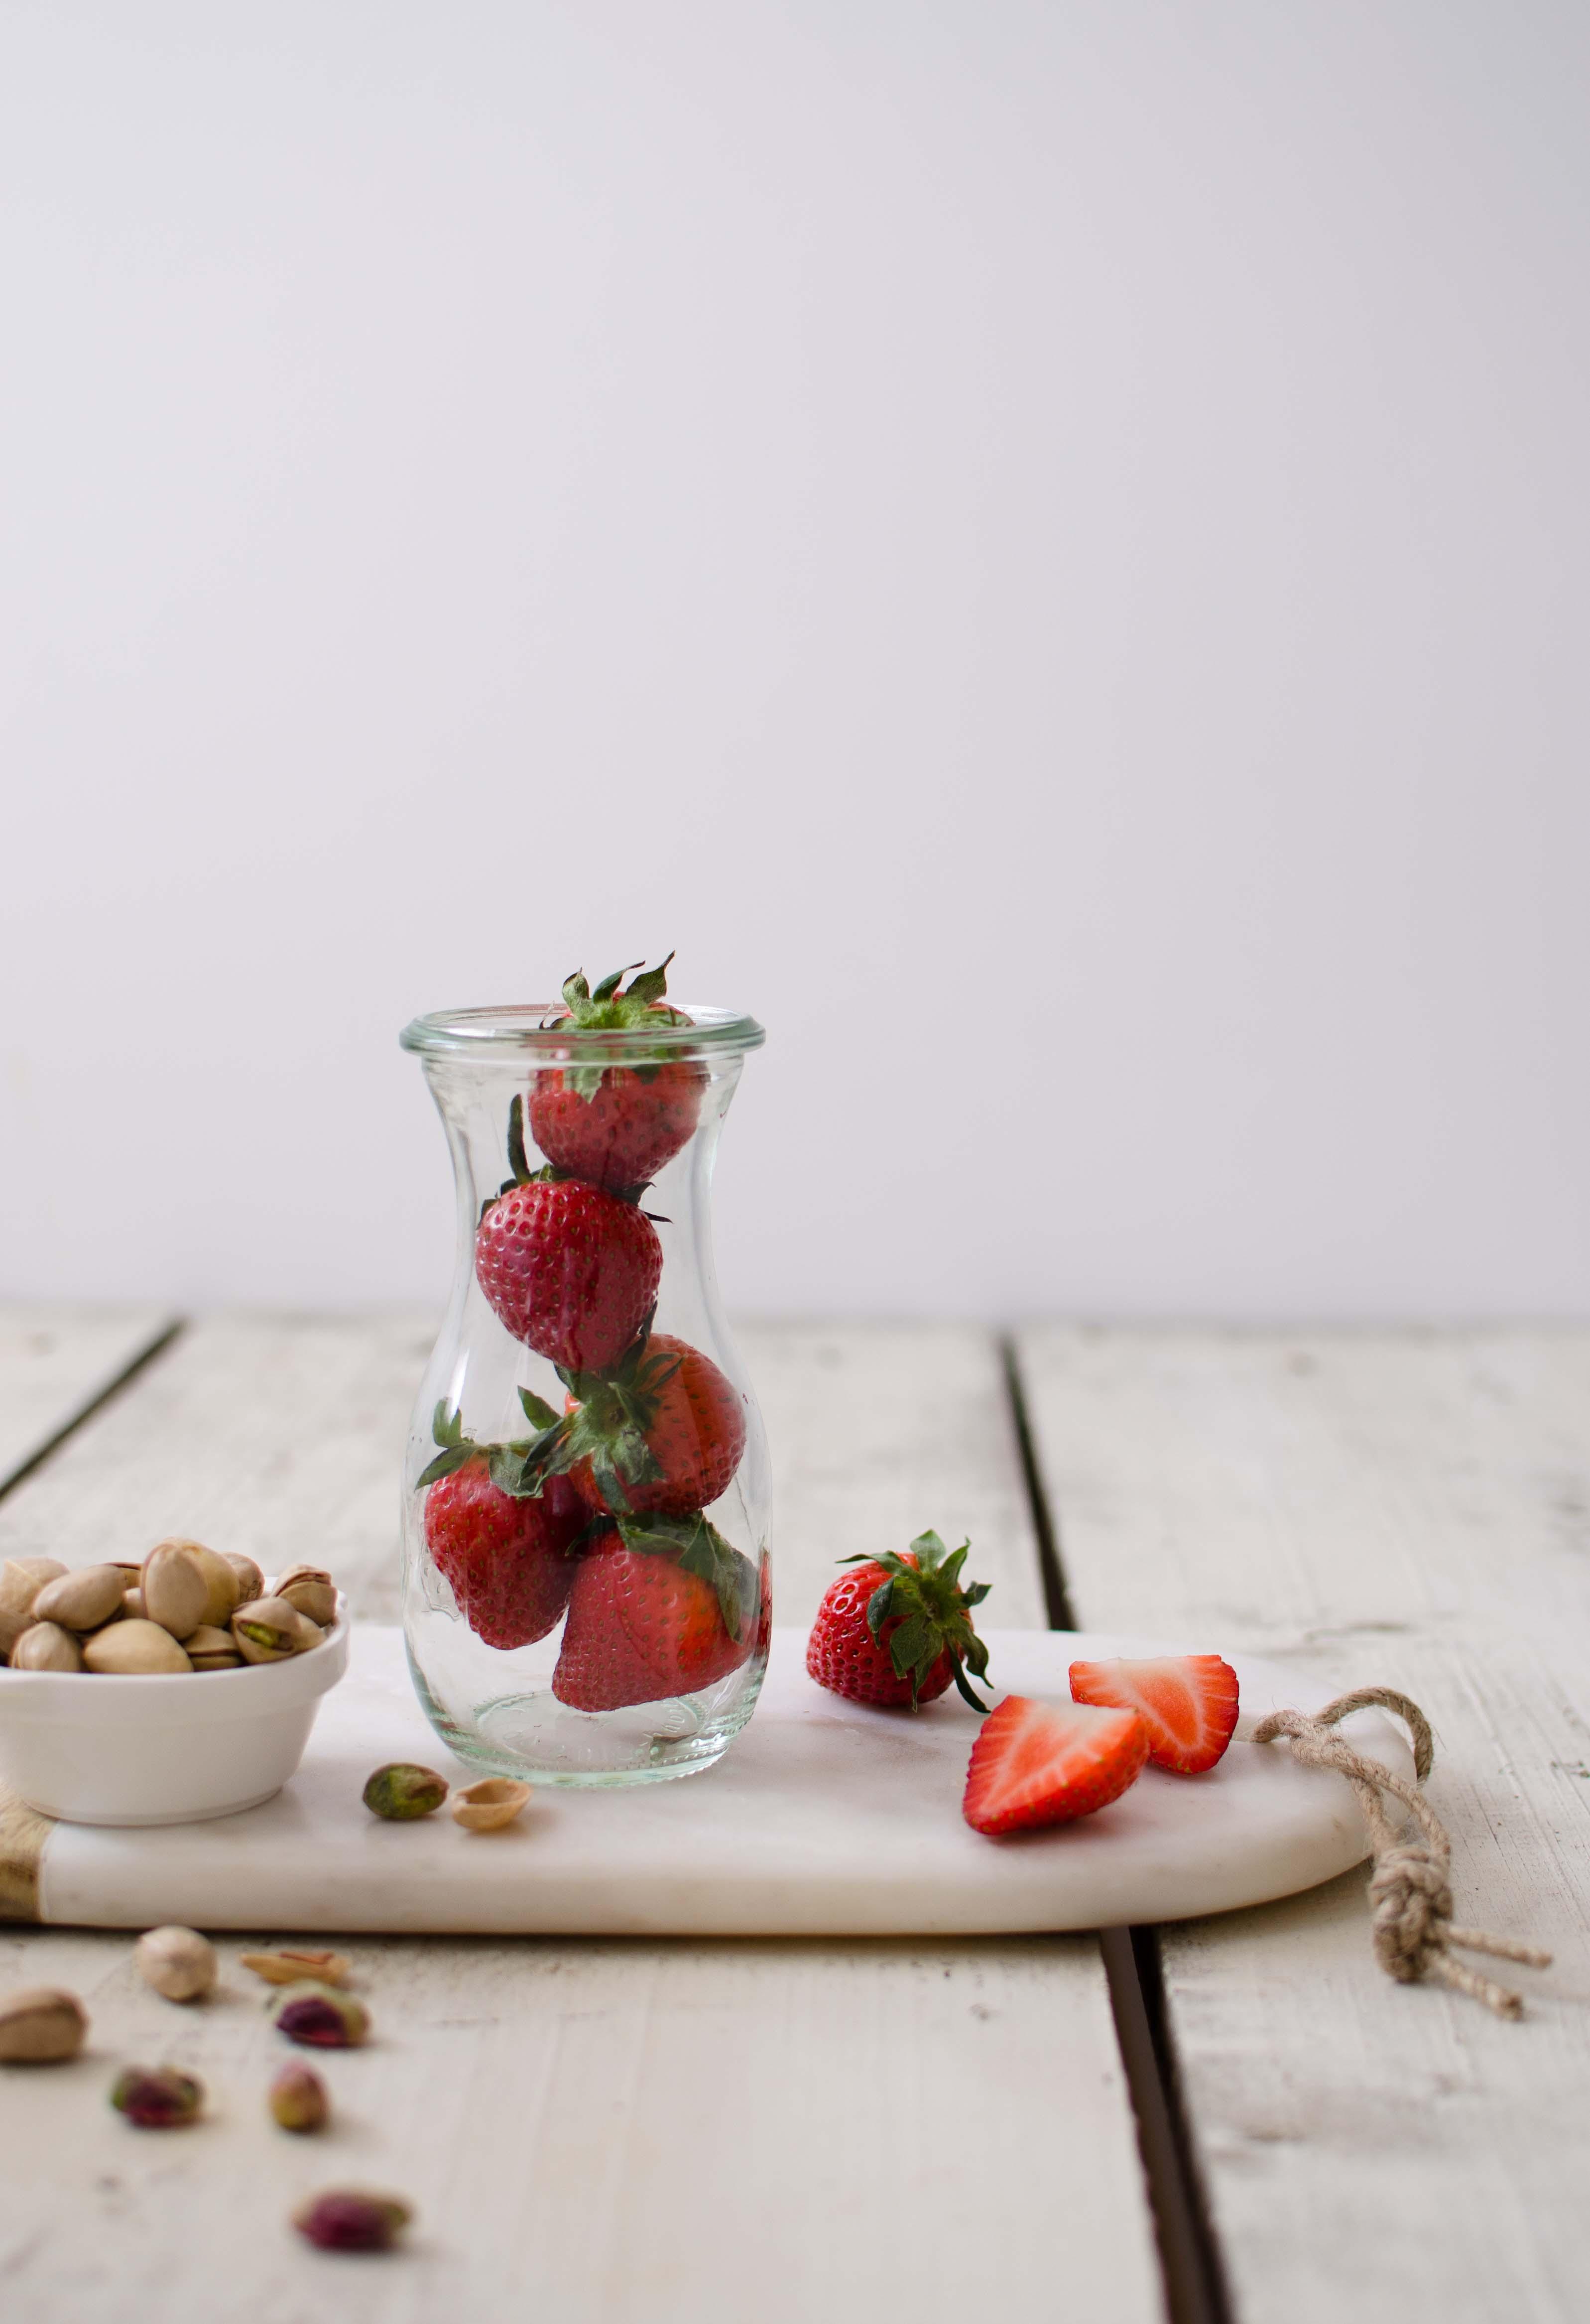 Fantastik_fragole_pistacchi Fantastik fragole e pistacchi